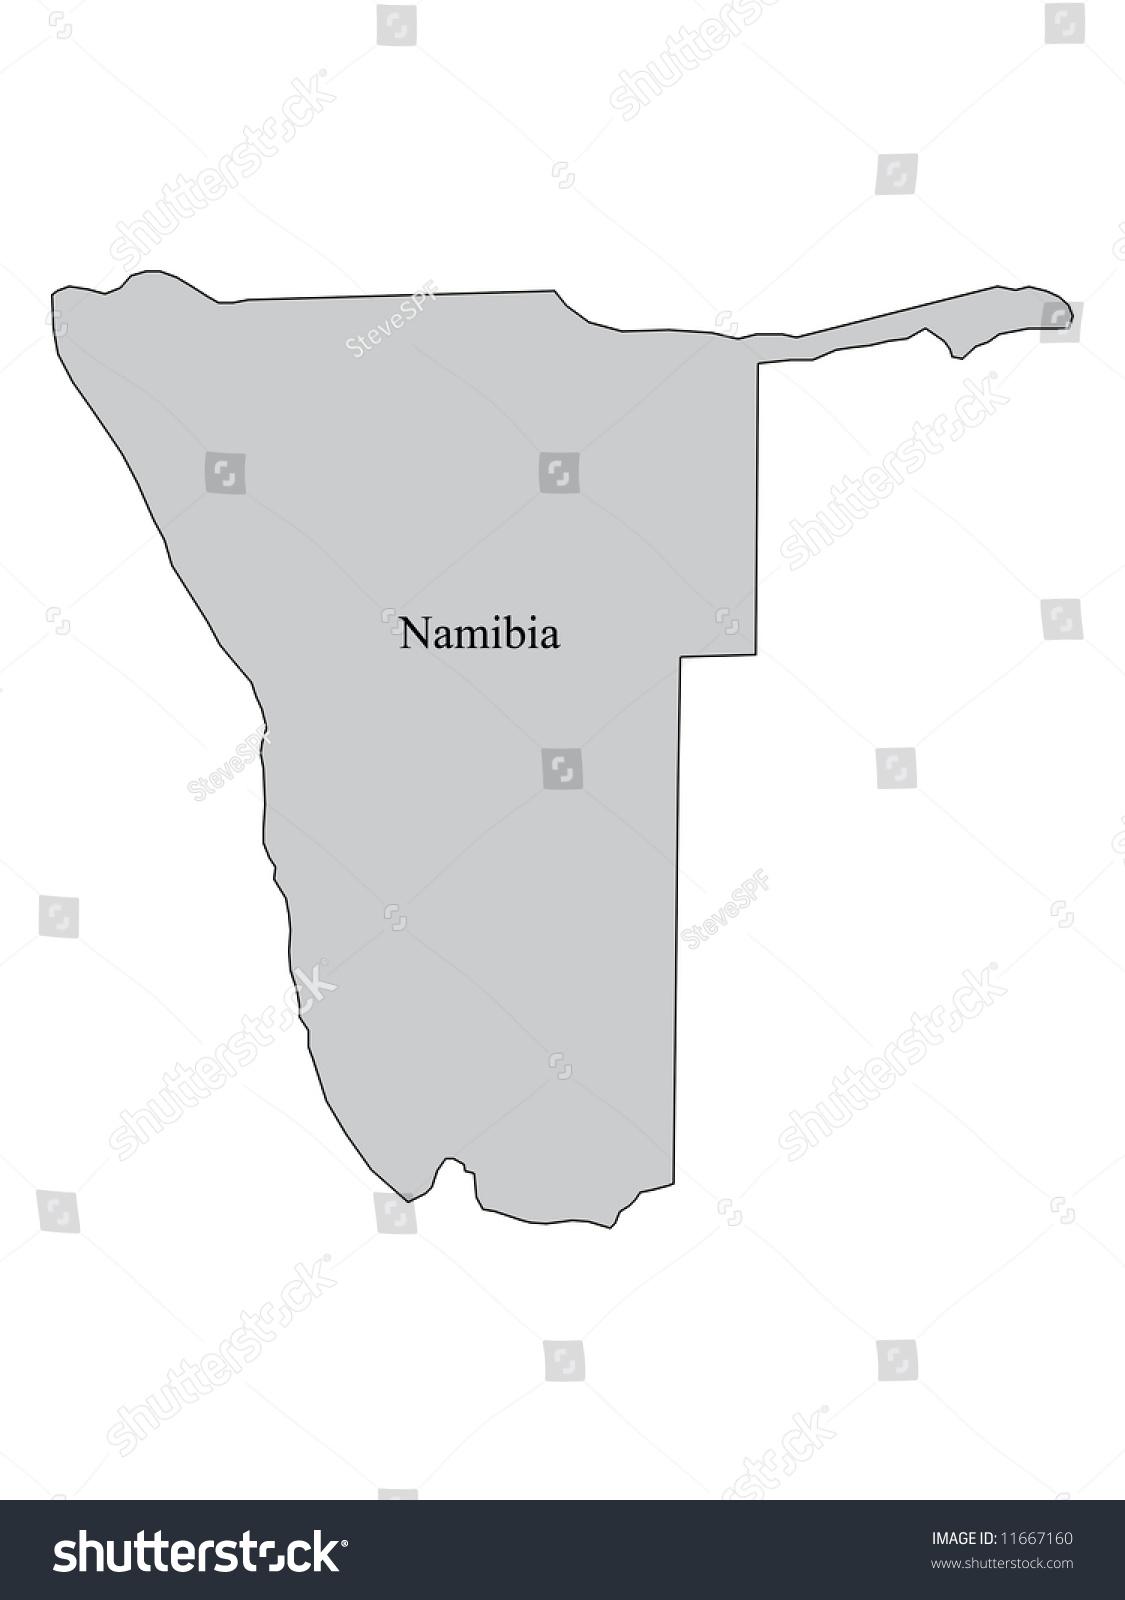 Namibia Map Outline Map Namibia Africa Stockillustration ...